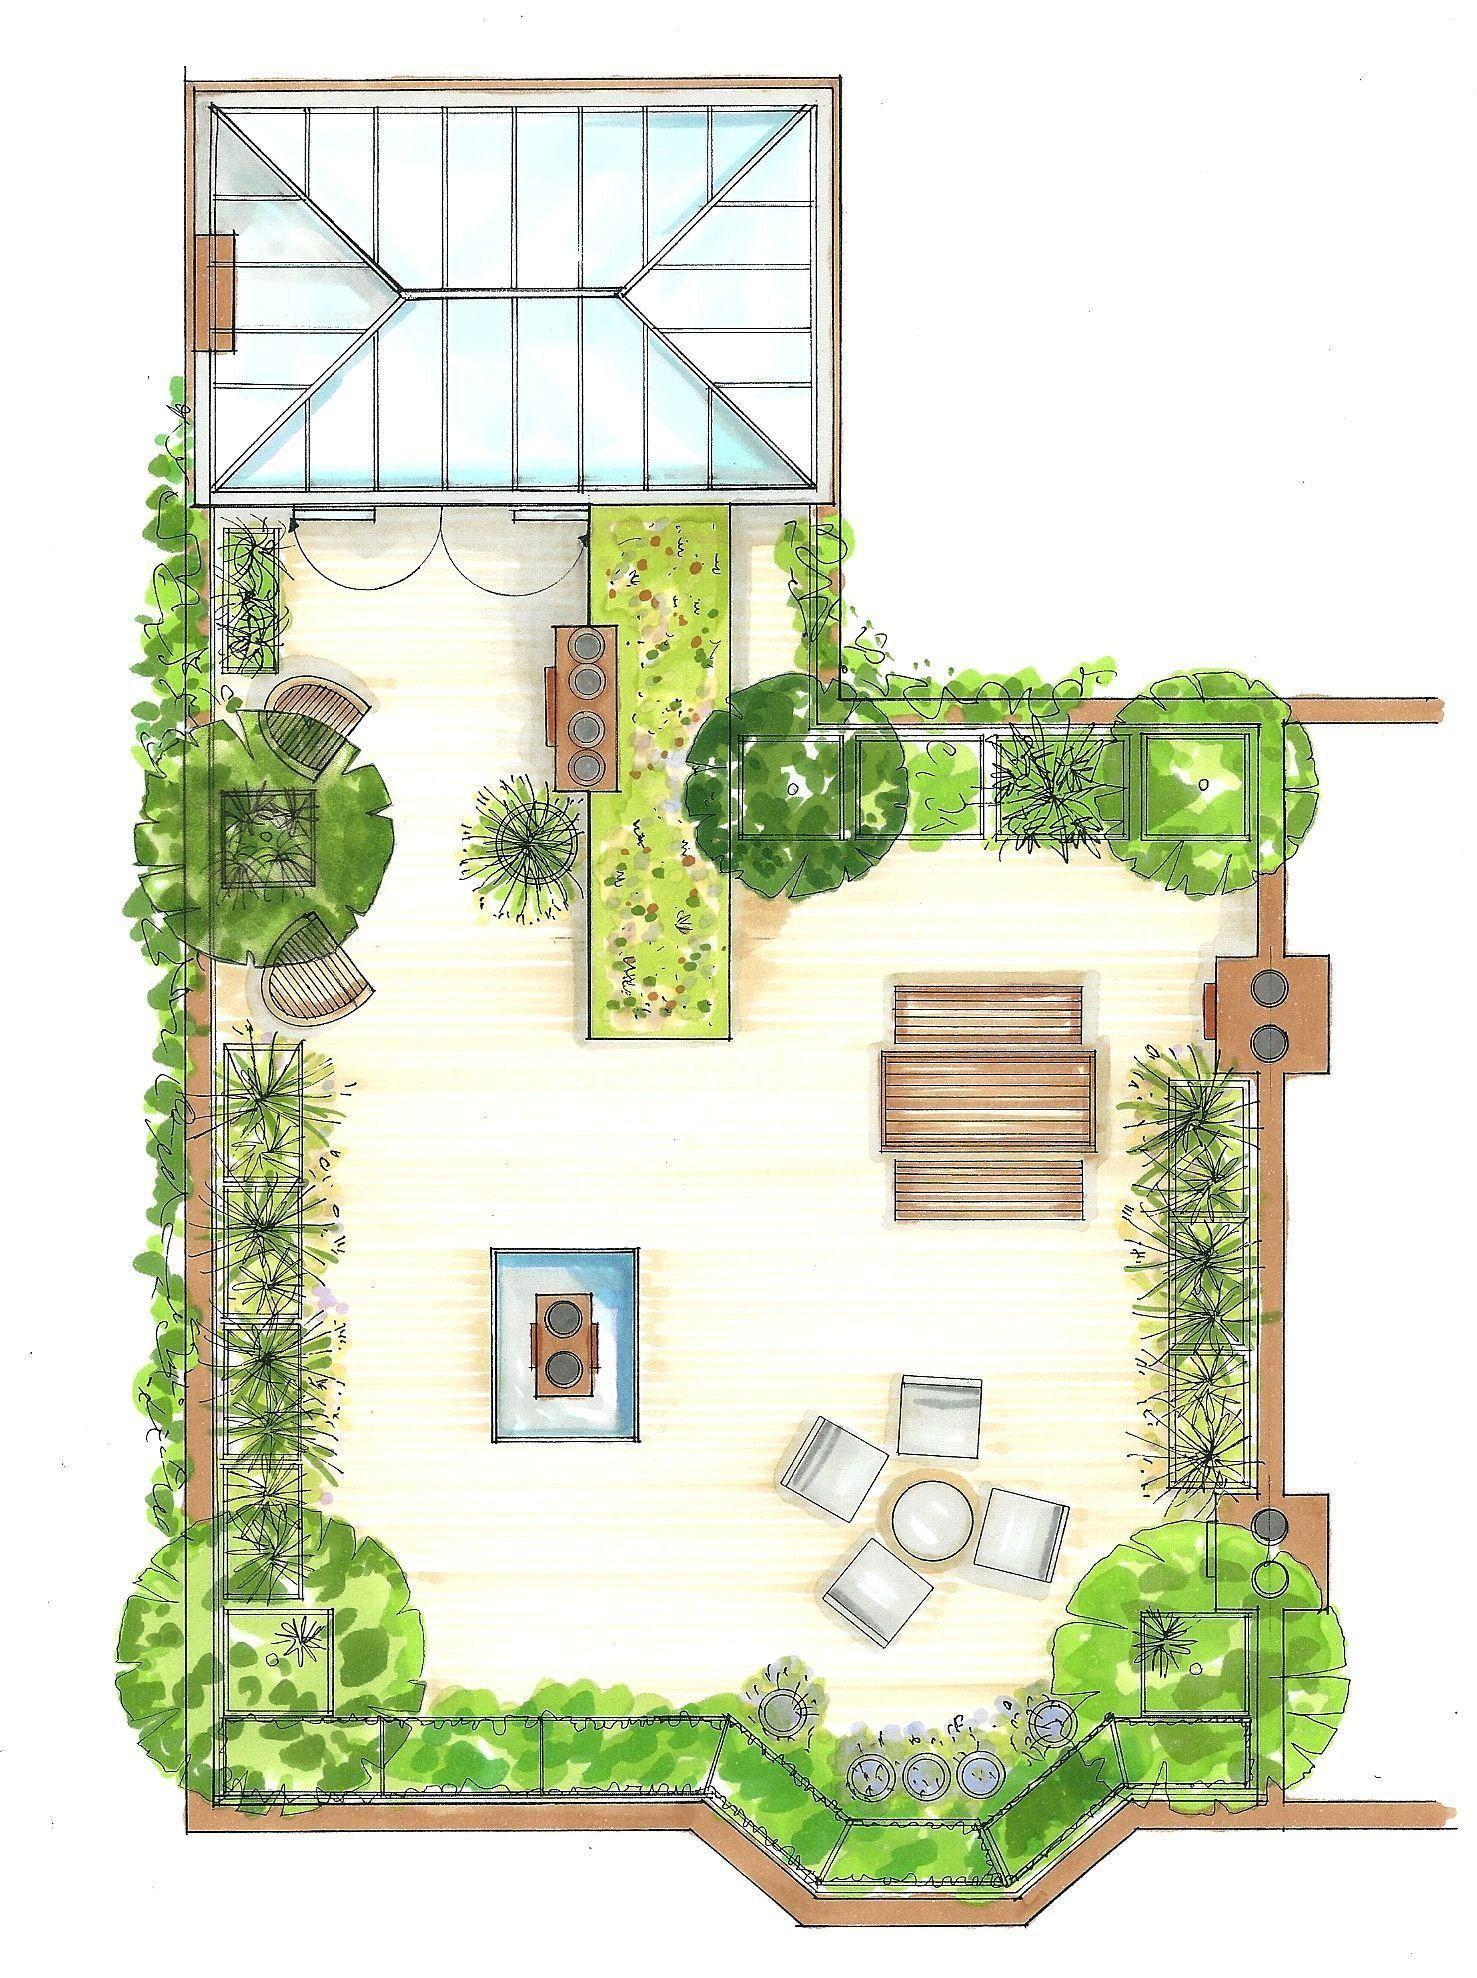 rooftop #garden #design #layout #roofRooftop Garden Design Layout